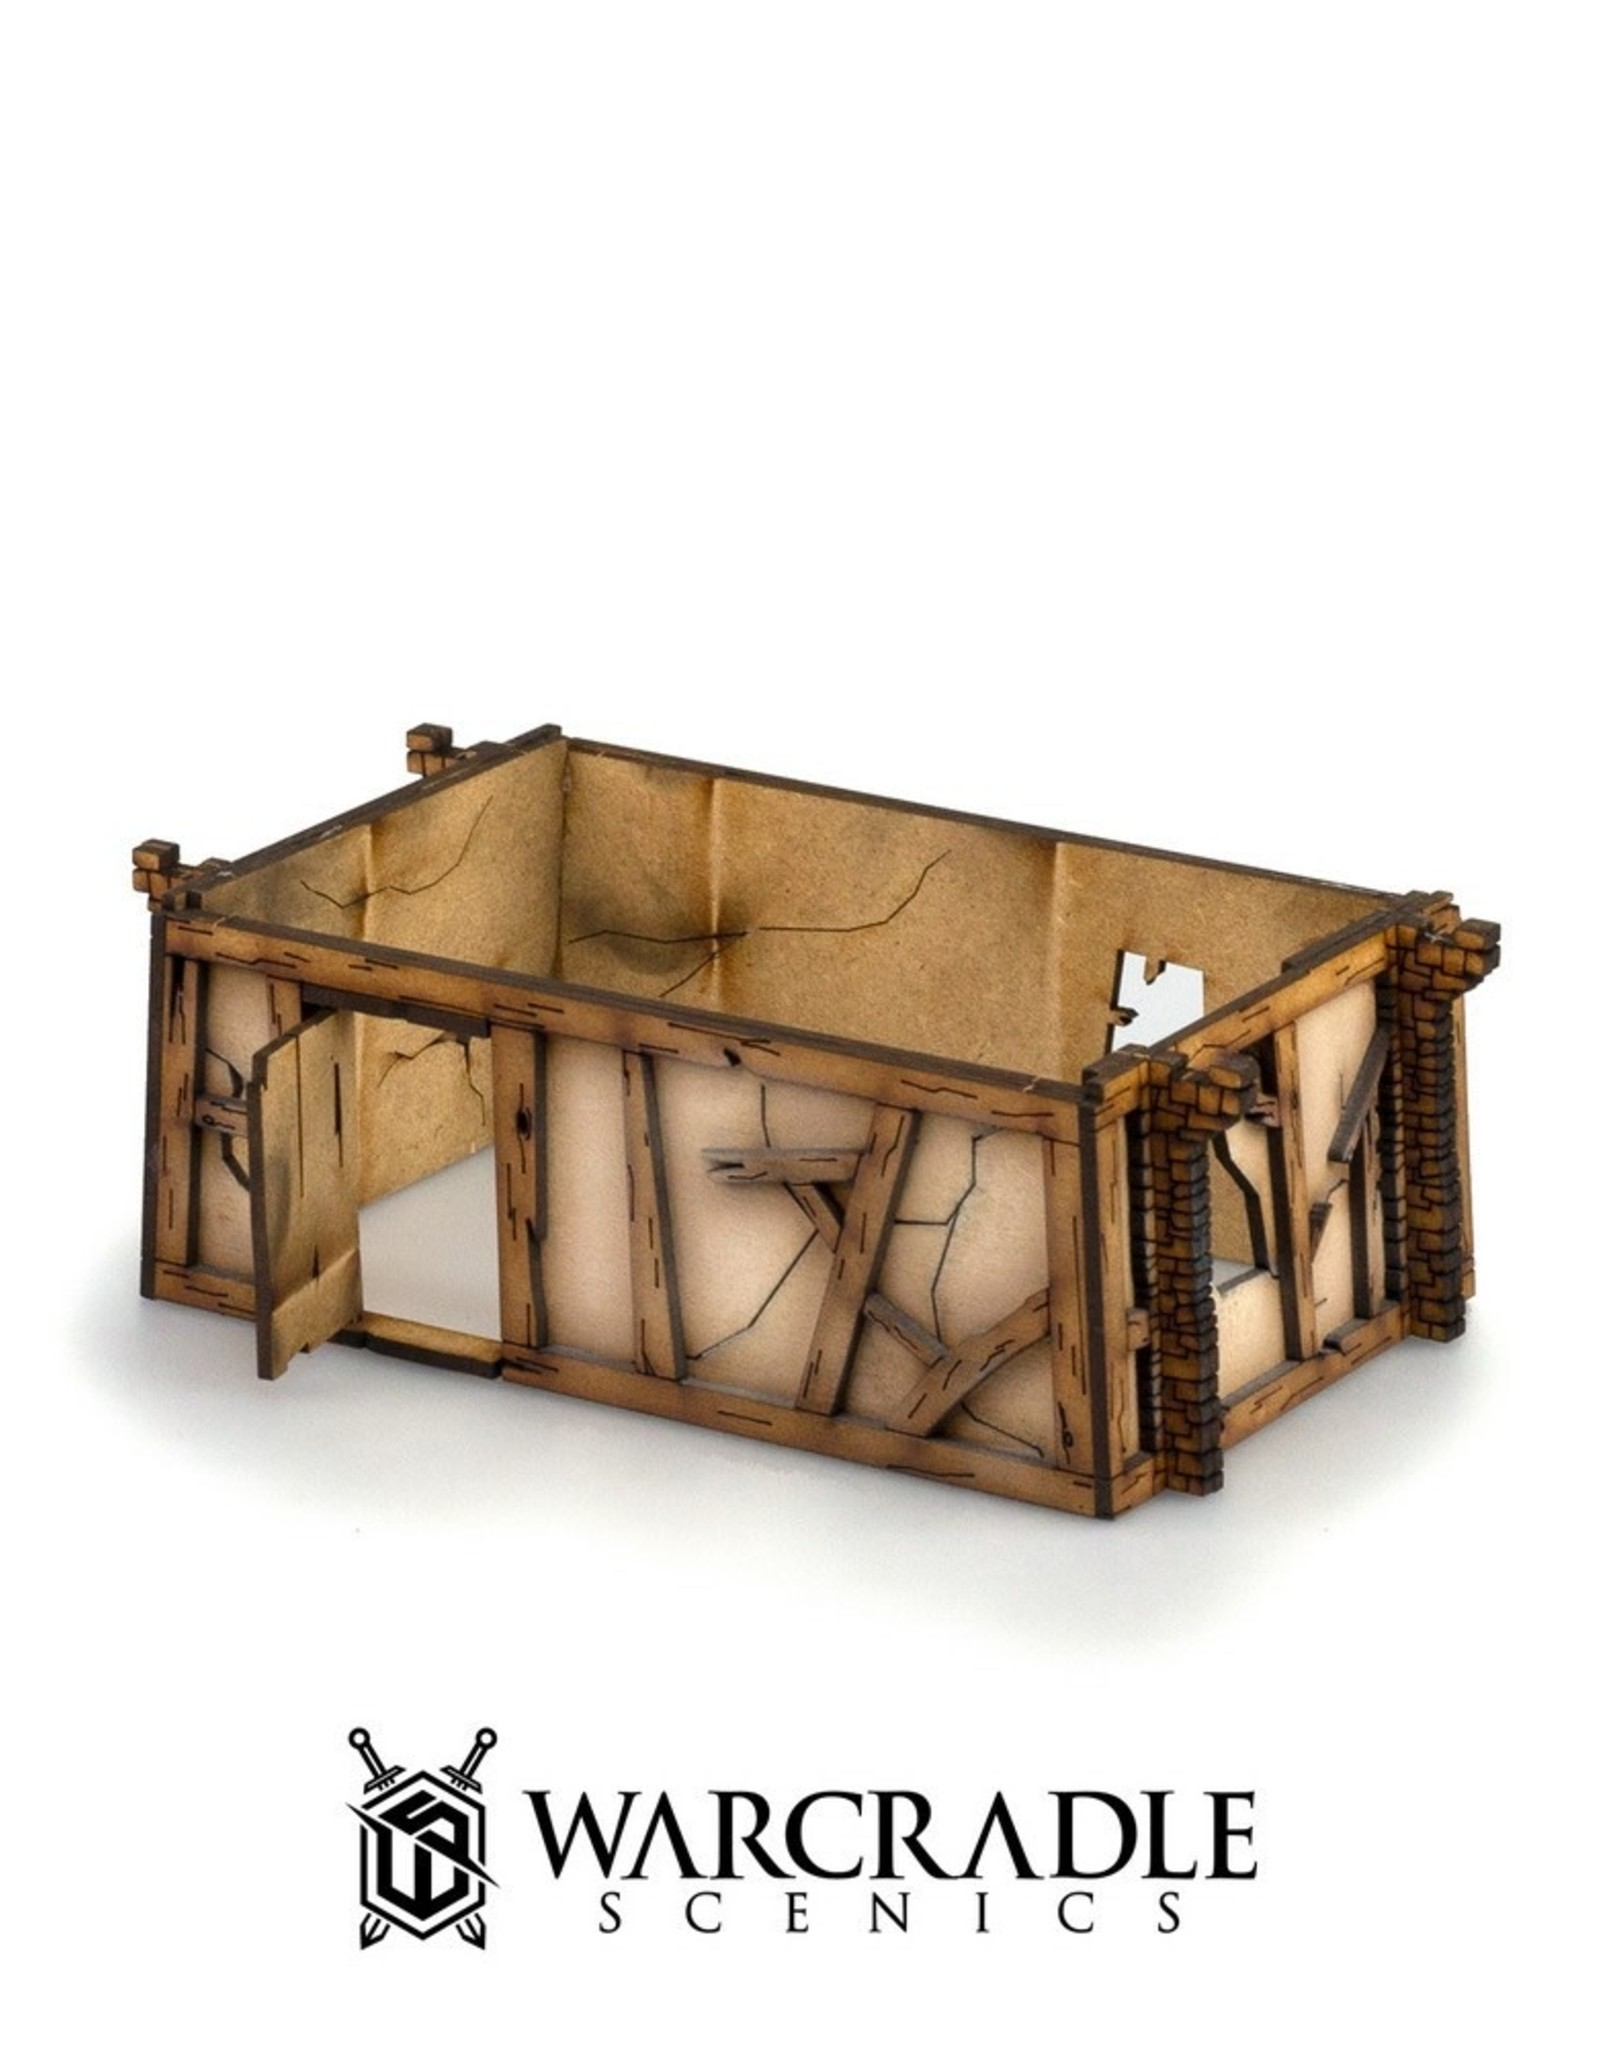 Warcradle Gloomburg: Cottage